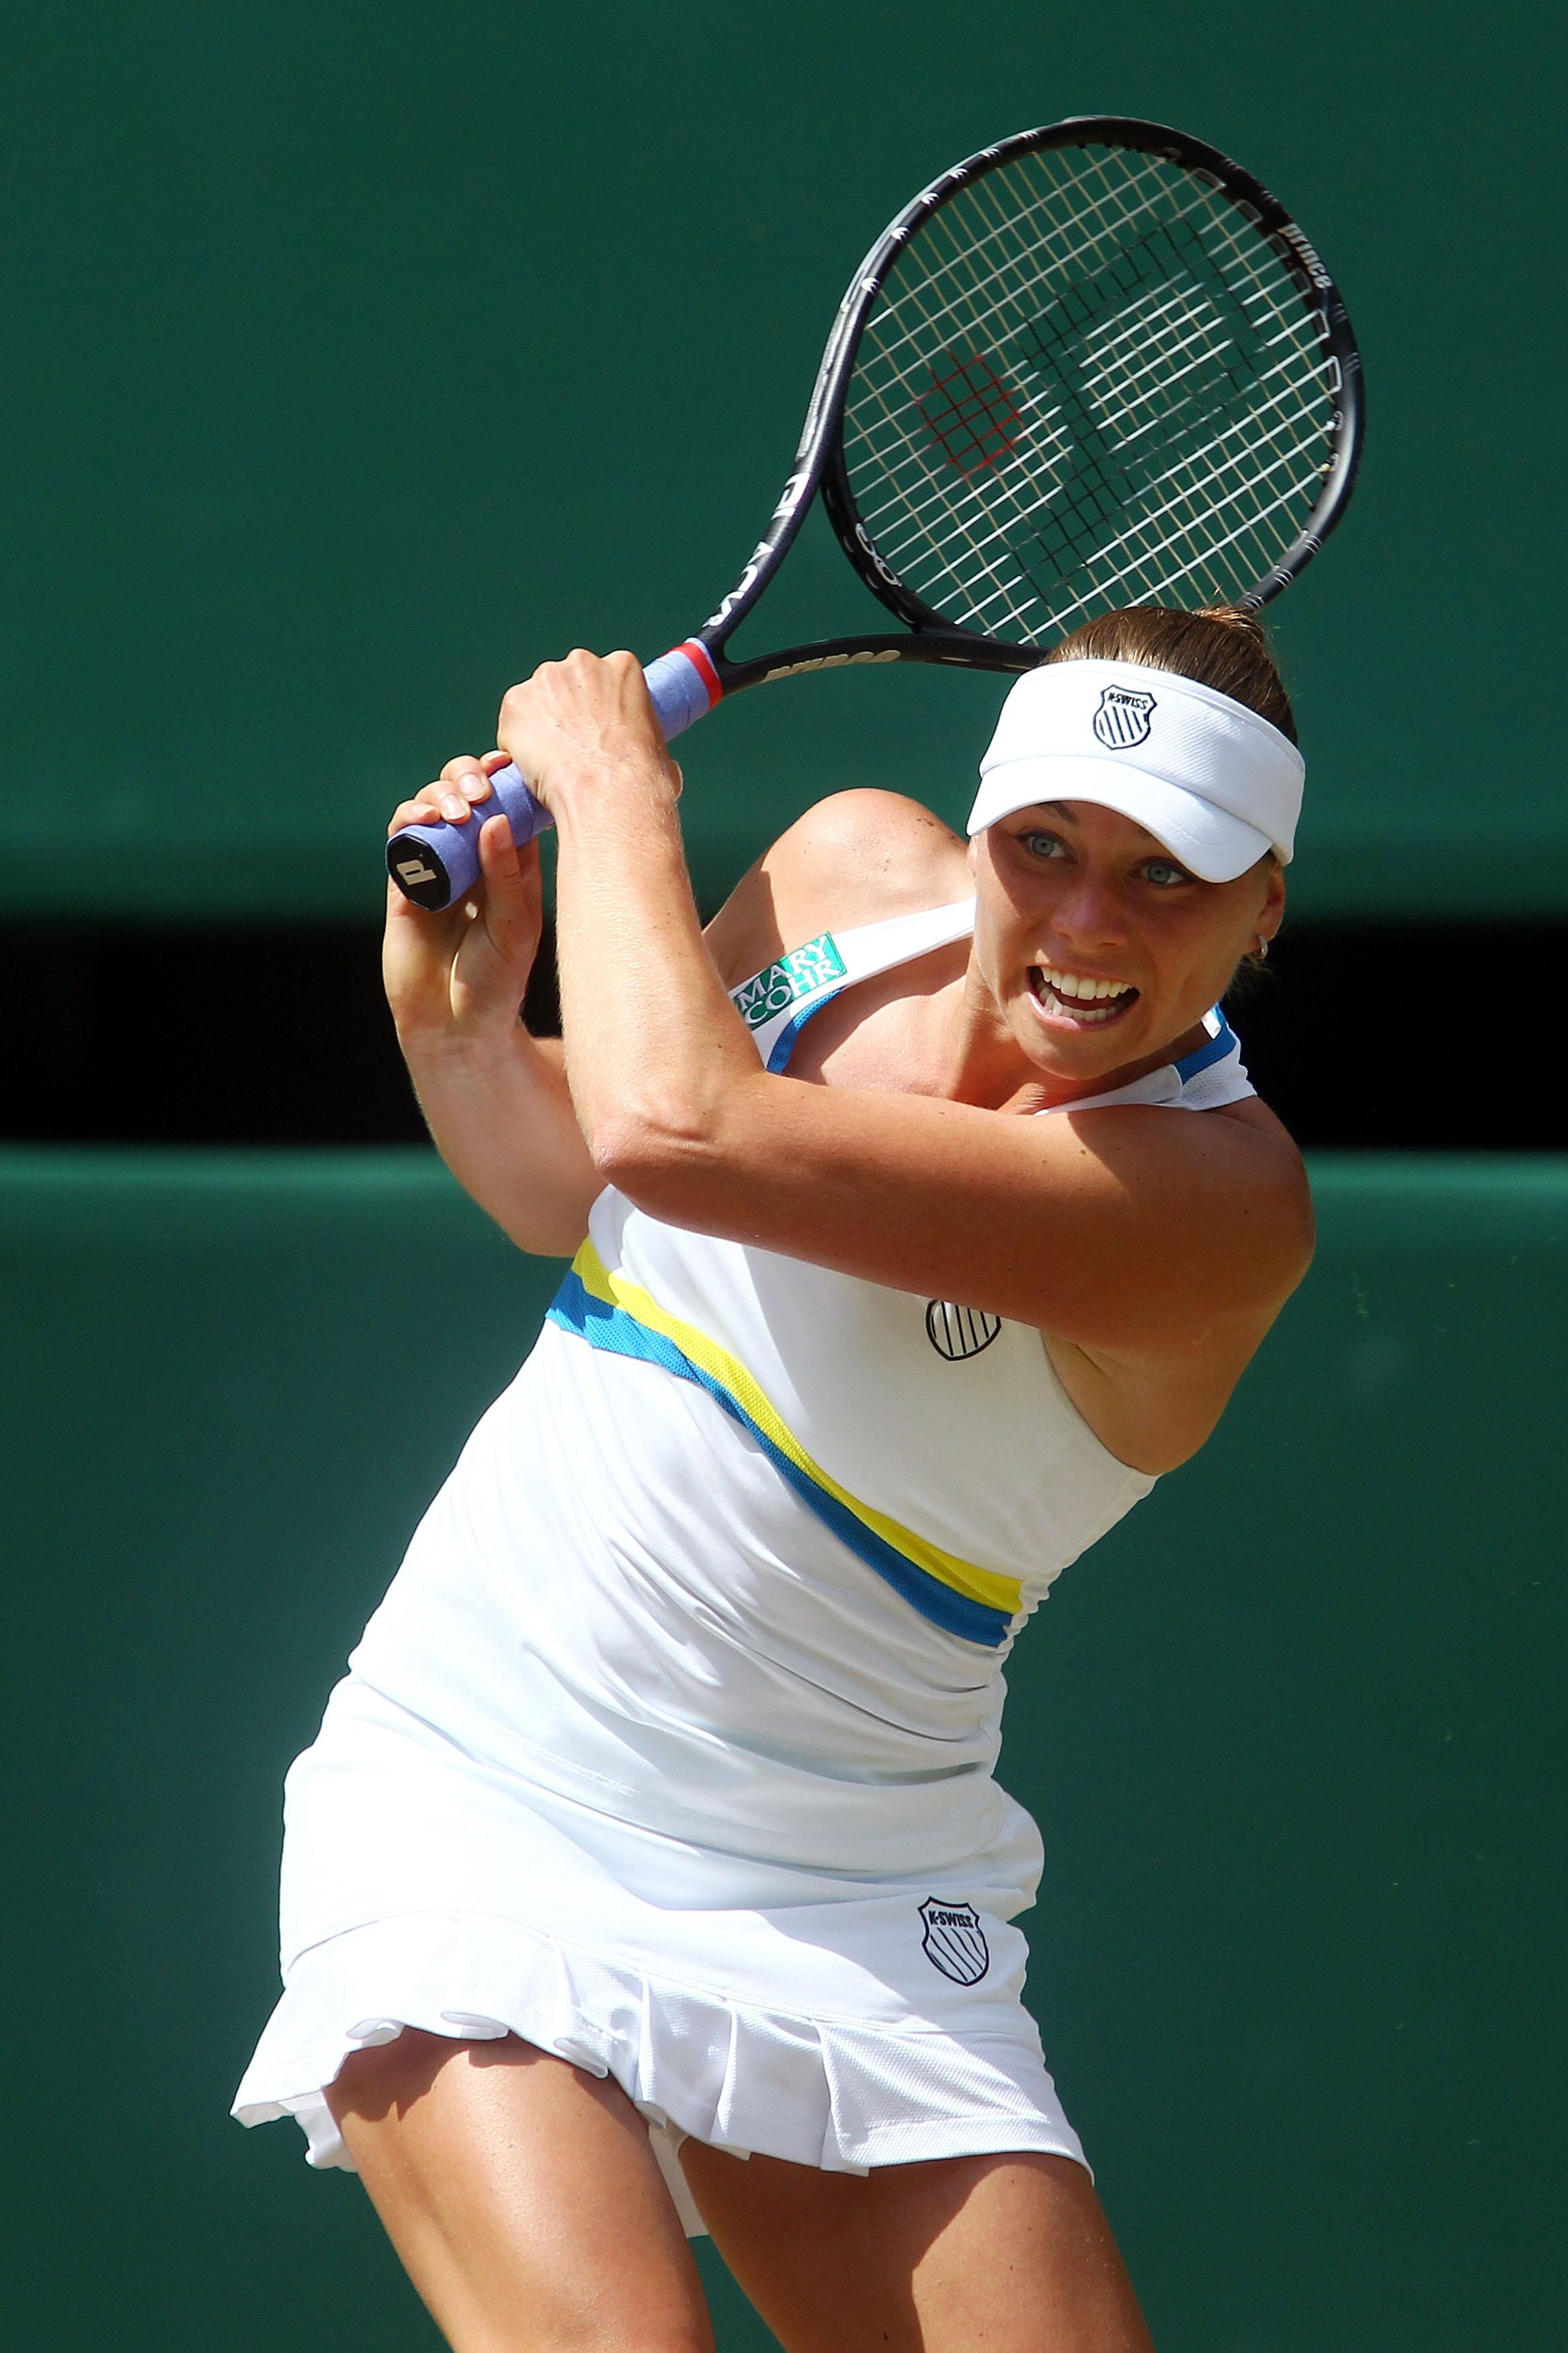 Vera Zvonareva in the 2010 Ladies' Singles final at Wimbledon.